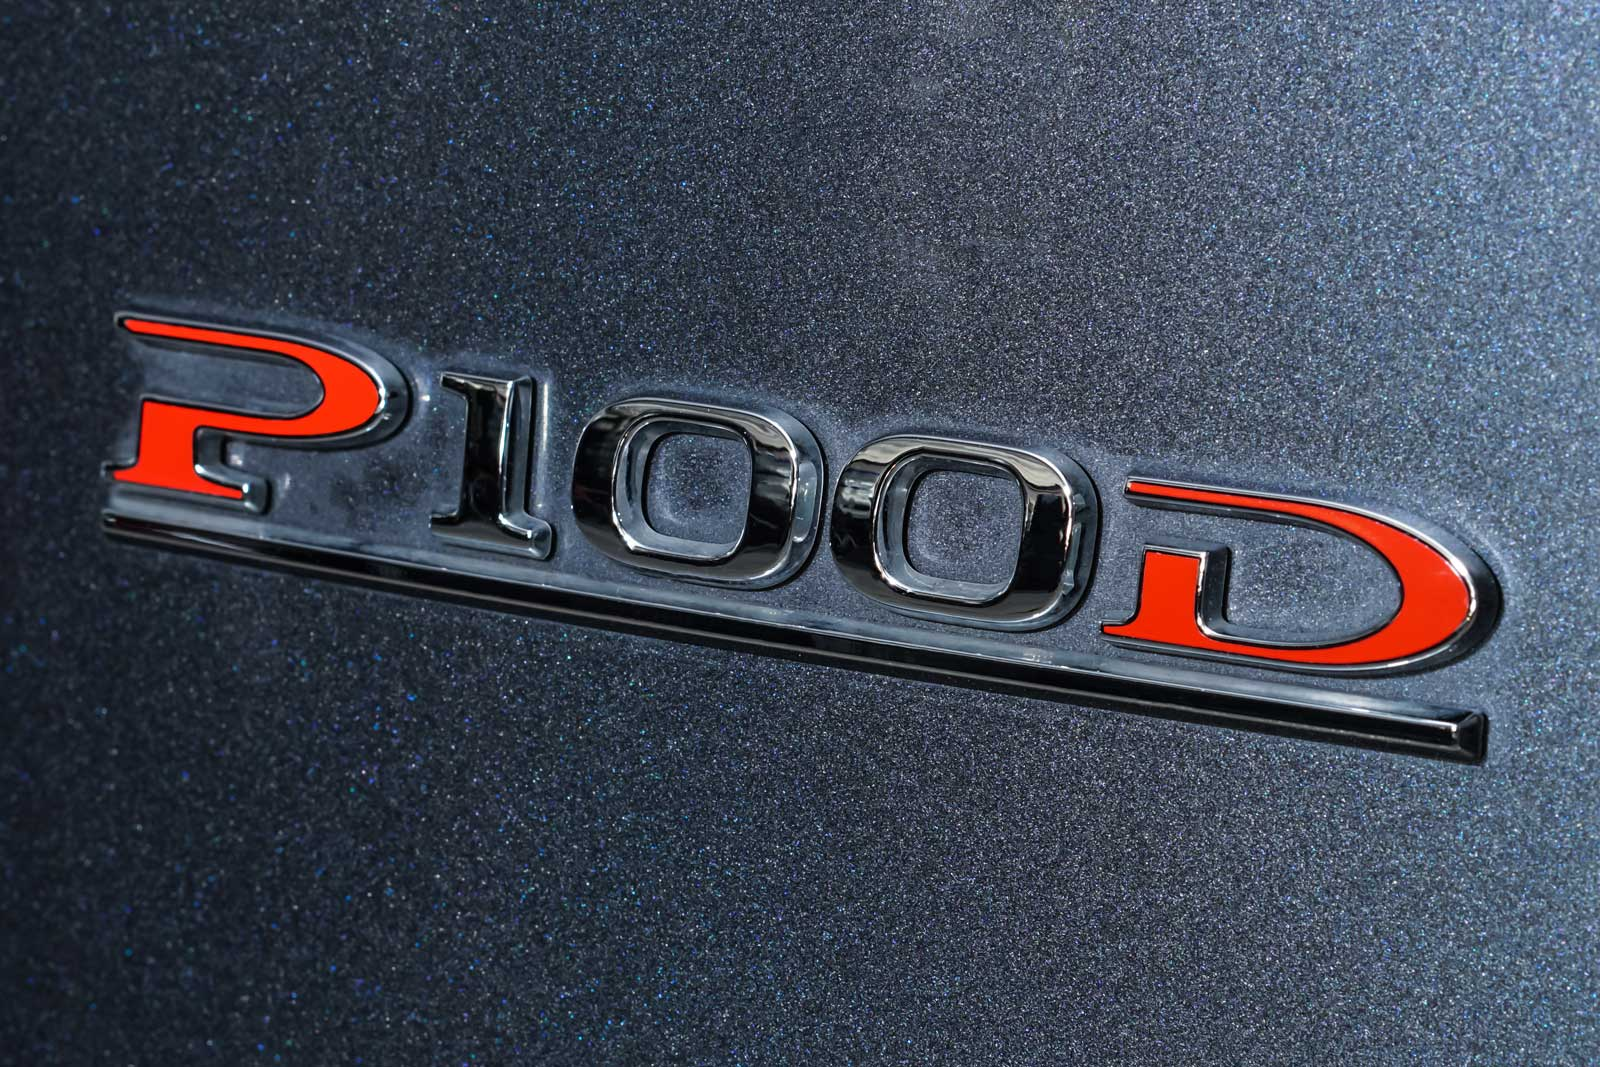 Tesla_ModelS_P100D_MidnightSilver_Black_TES-6539_20_w